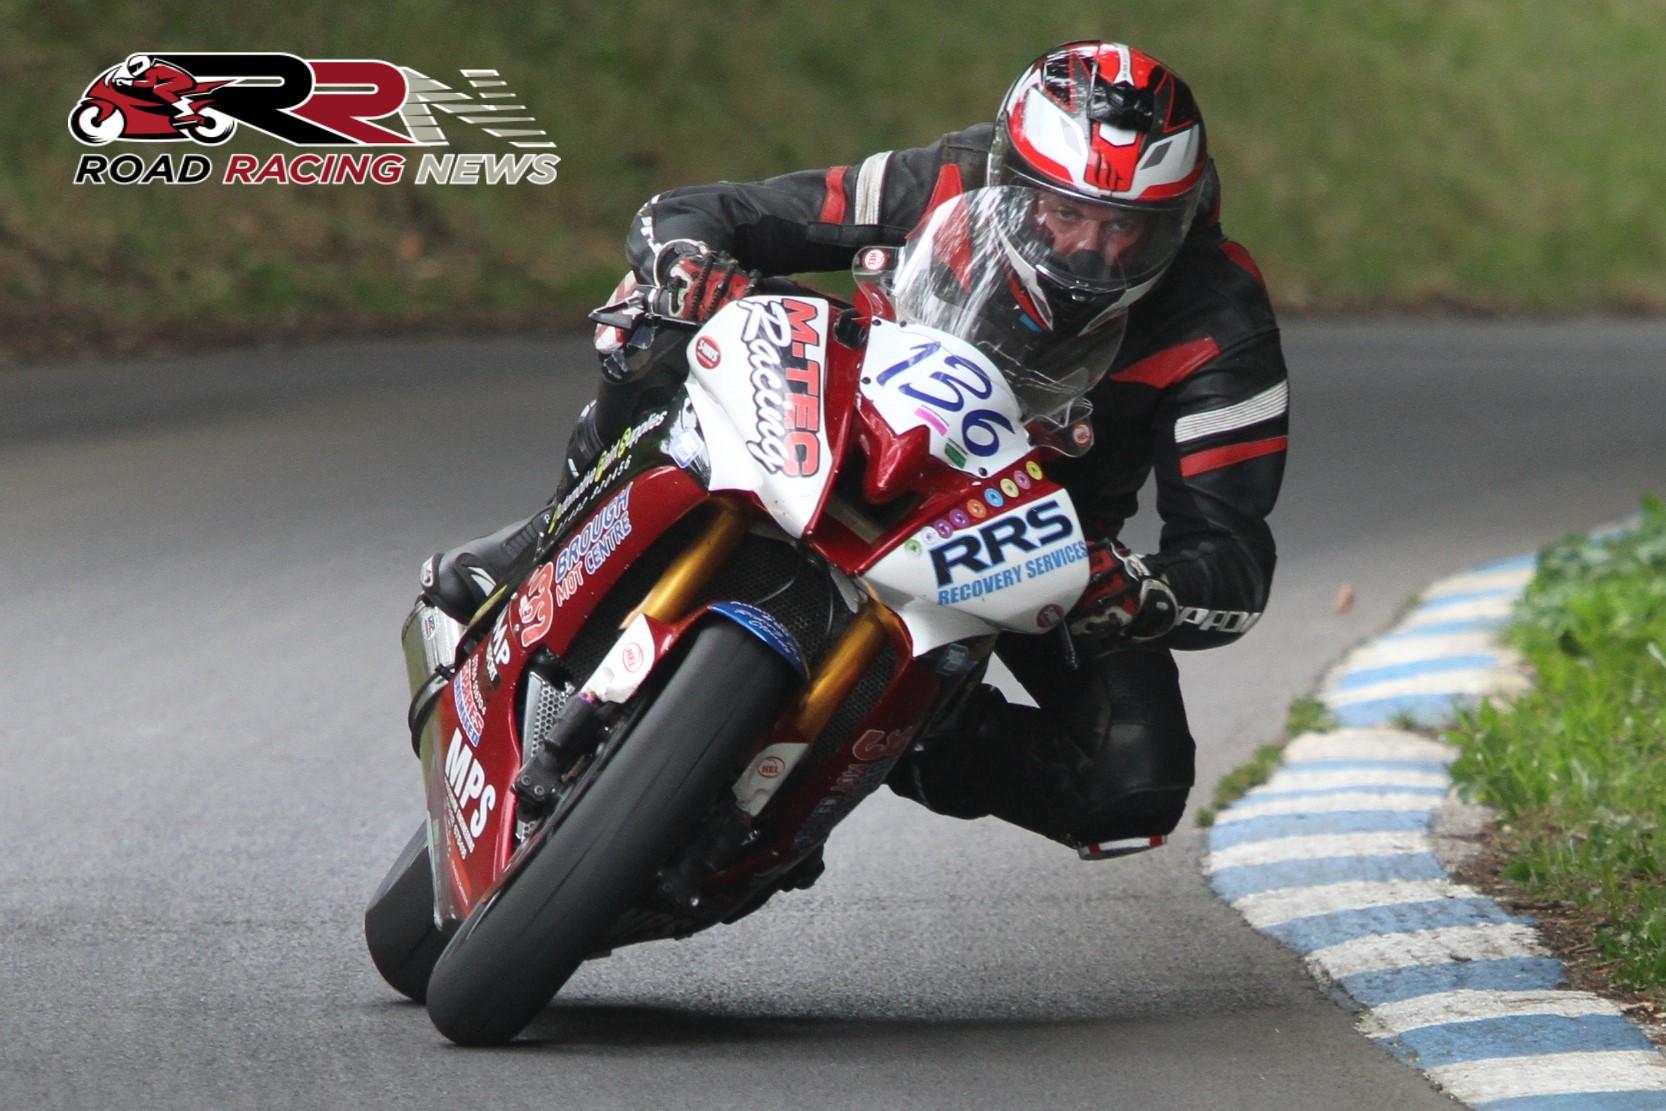 Road Racing News Newsletter – September Edition